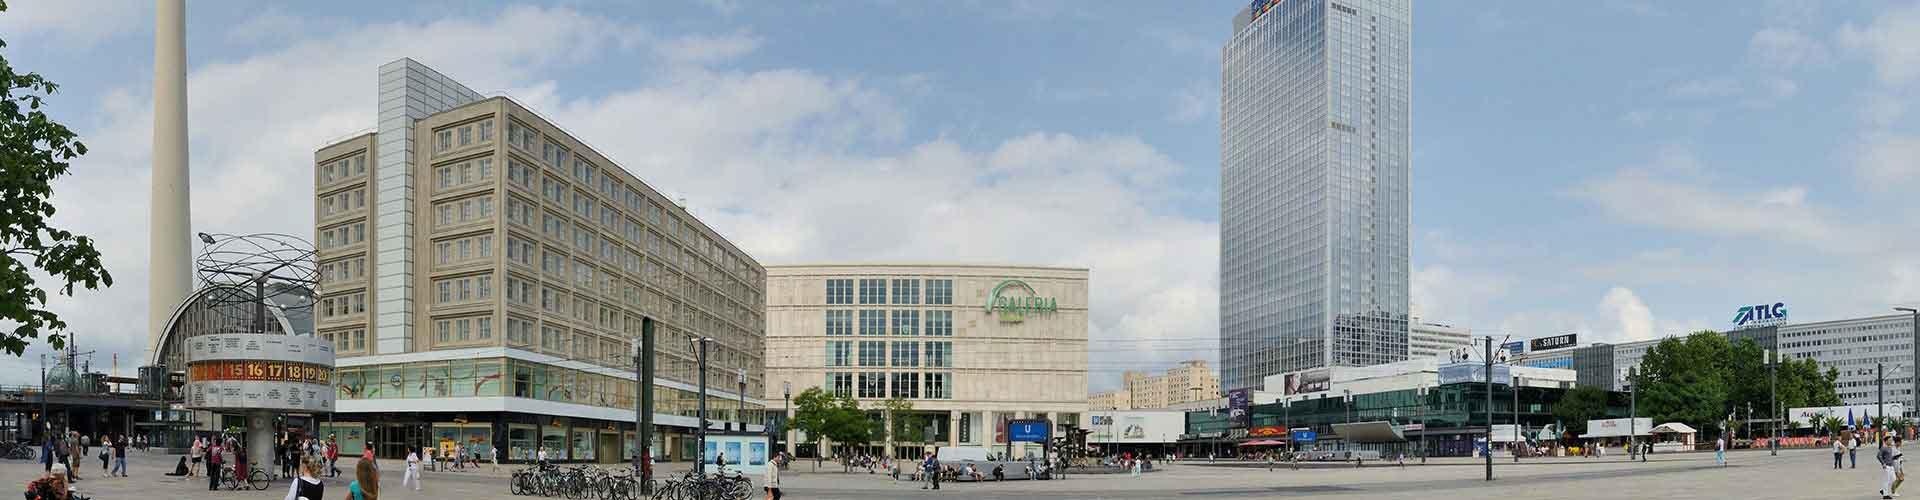 Berlín - Hoteles baratos cerca a Alexanderplatz. Mapas de Berlín, Fotos y comentarios de cada Hotel en Berlín.